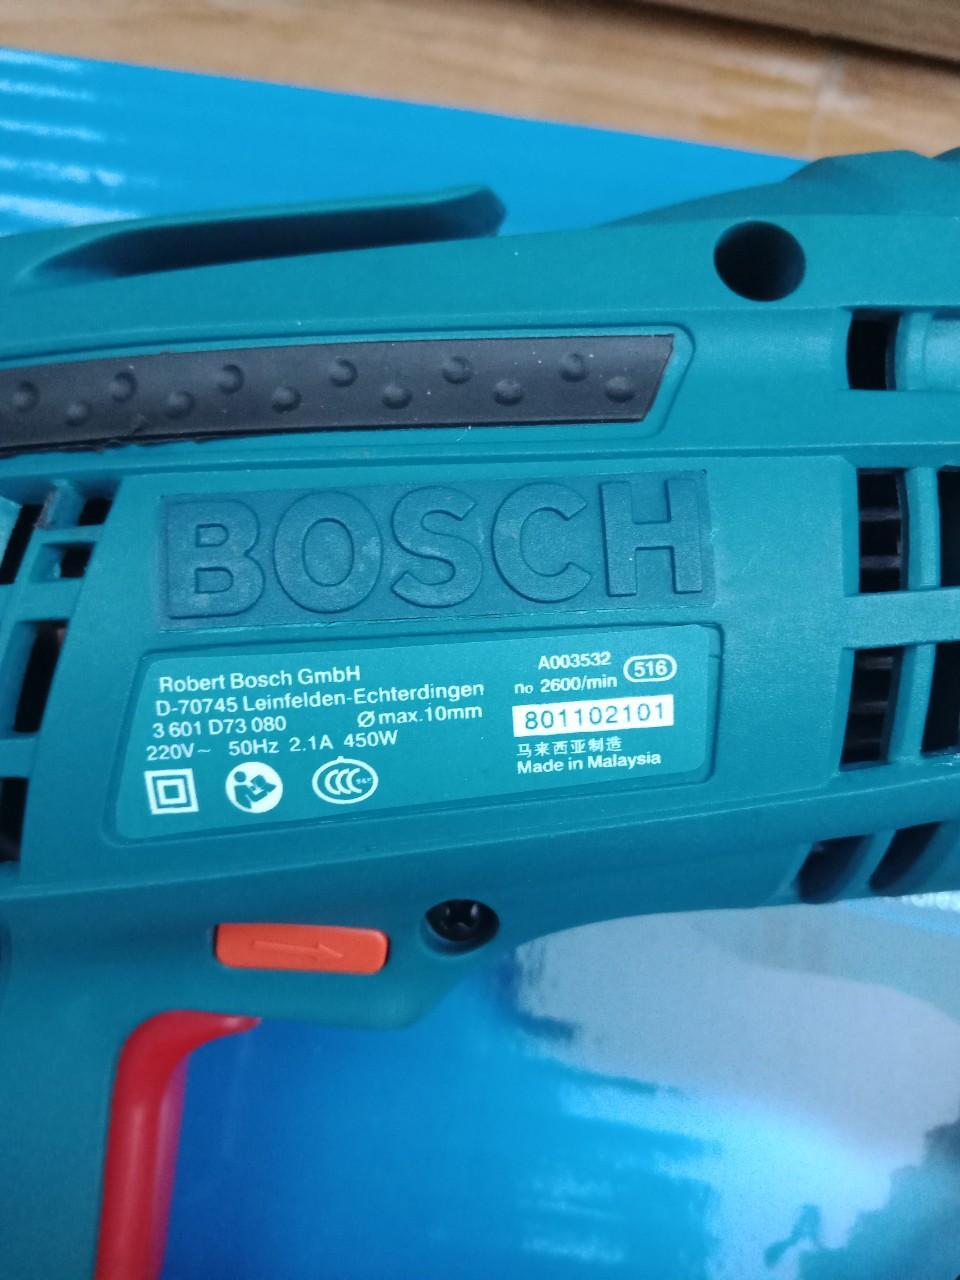 Máy khoan Bosch 10ly 1  may khoan cam tay  may khoan gia re